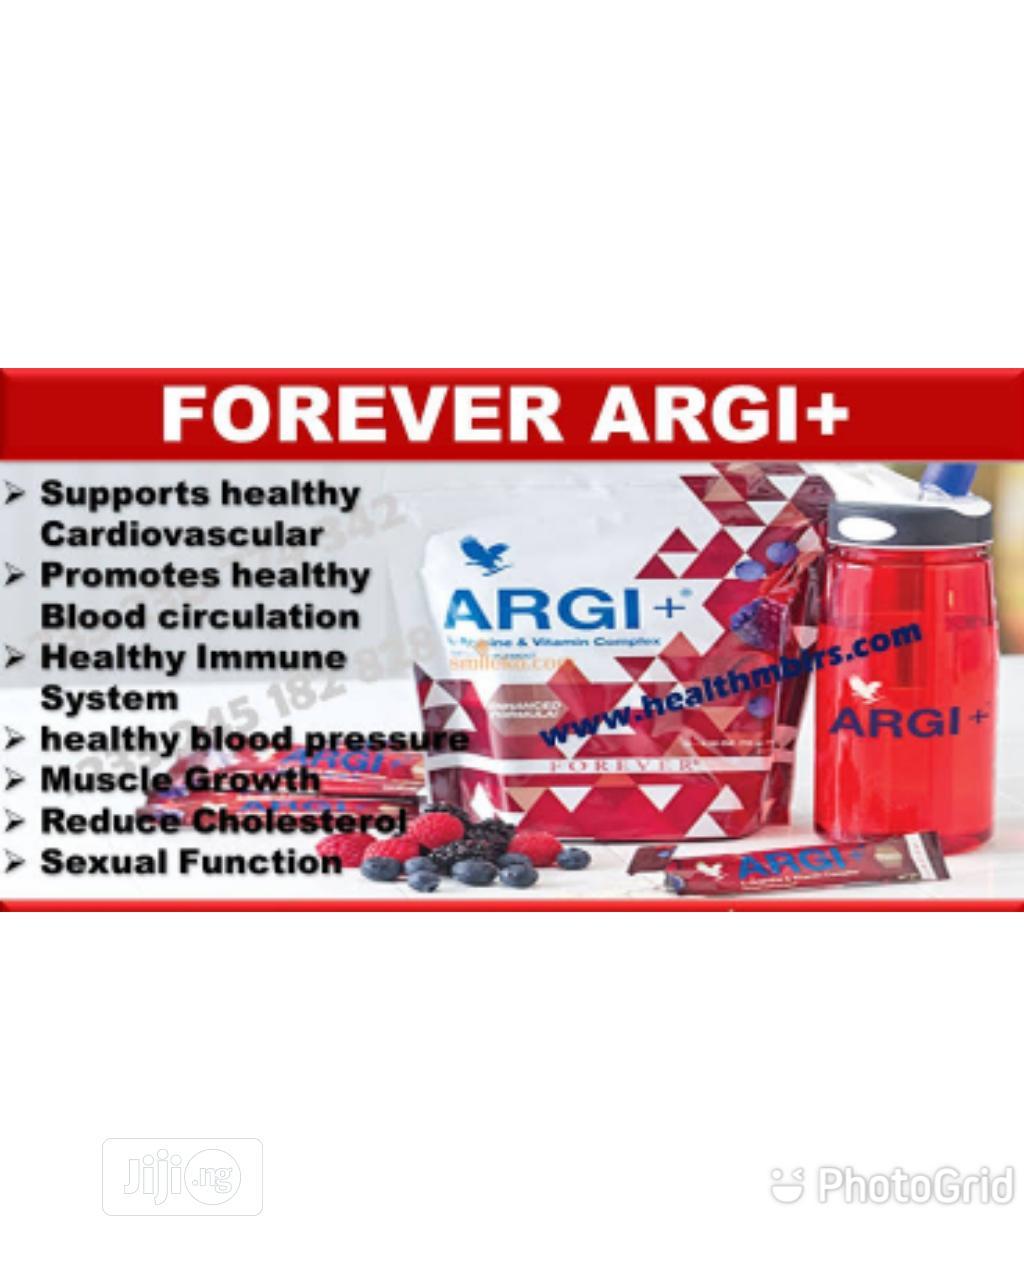 Argi+ for Stroke,Cardiovascular Health, Erection Dysfunction